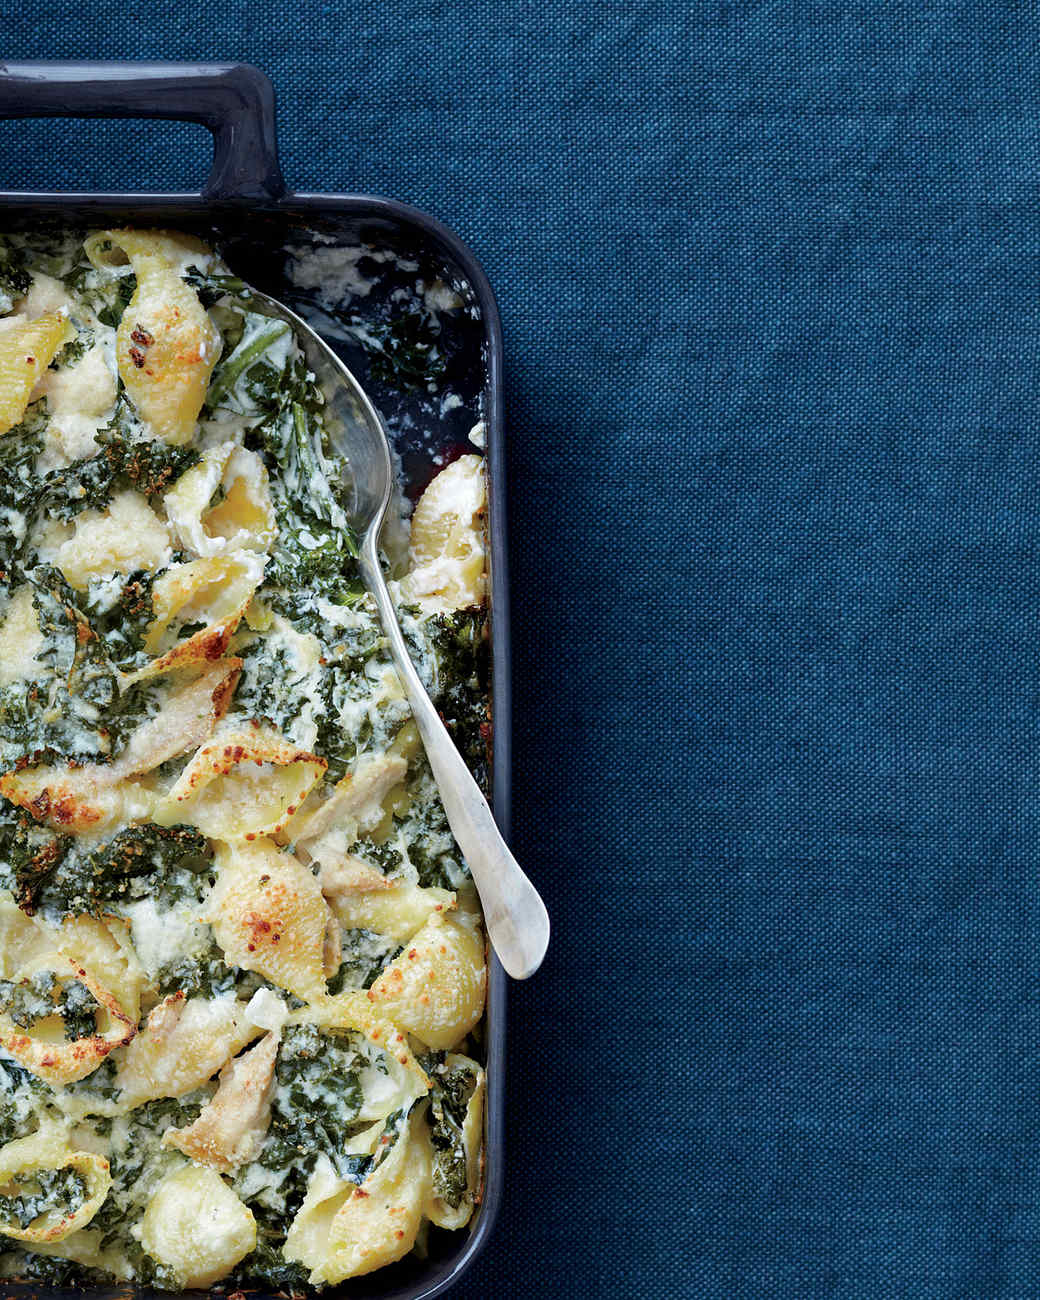 chicken-kale-casserole-med107616.jpg